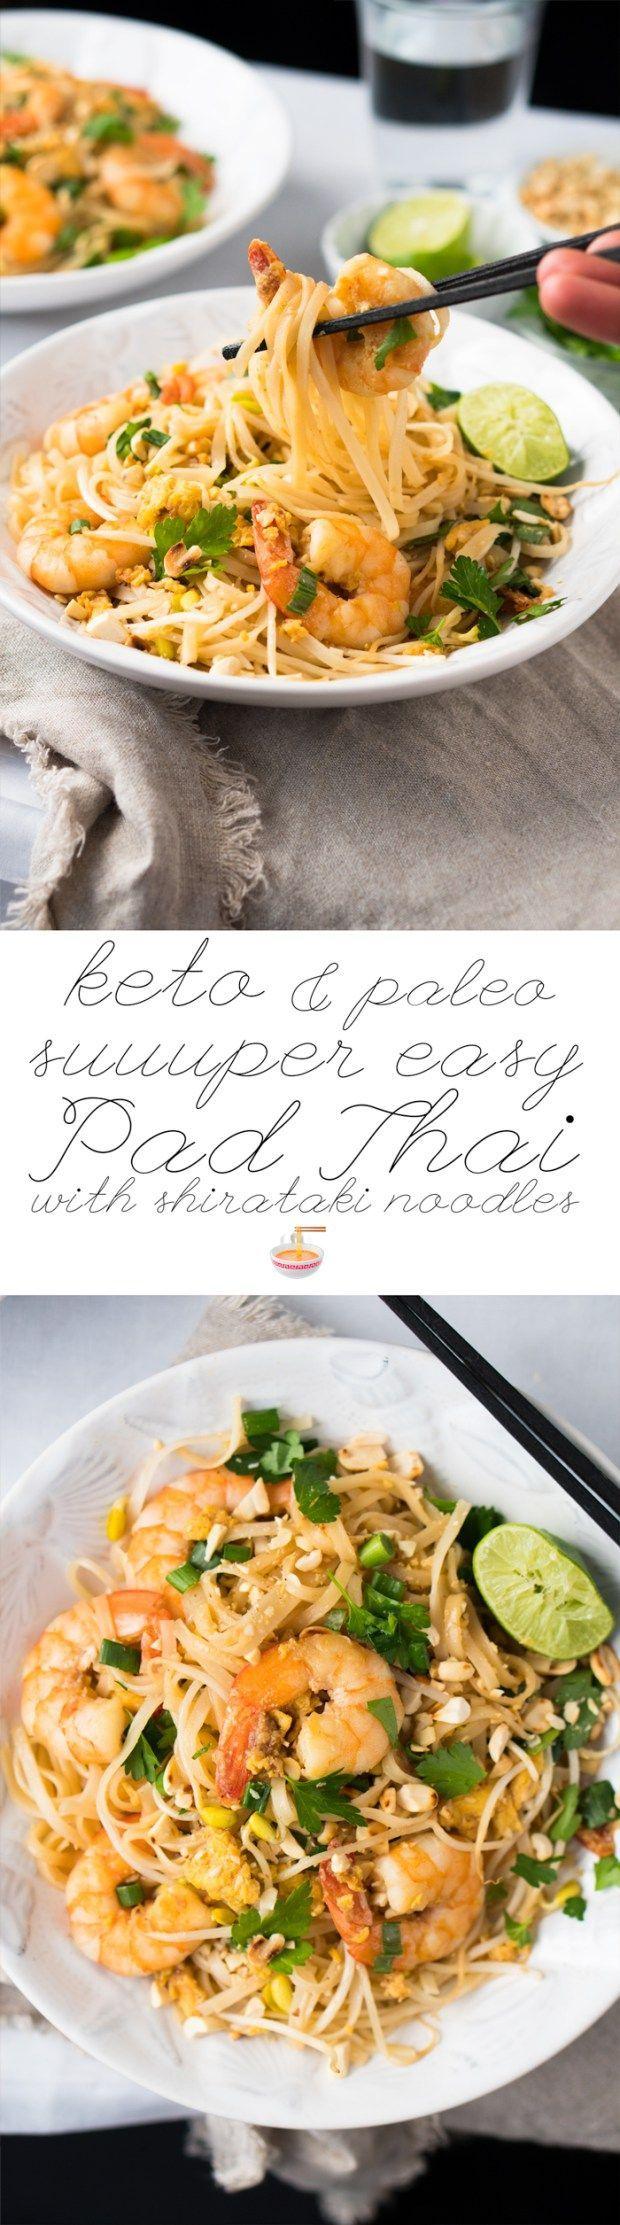 paleo  keto pad thai with shirataki noodles suuuper easy